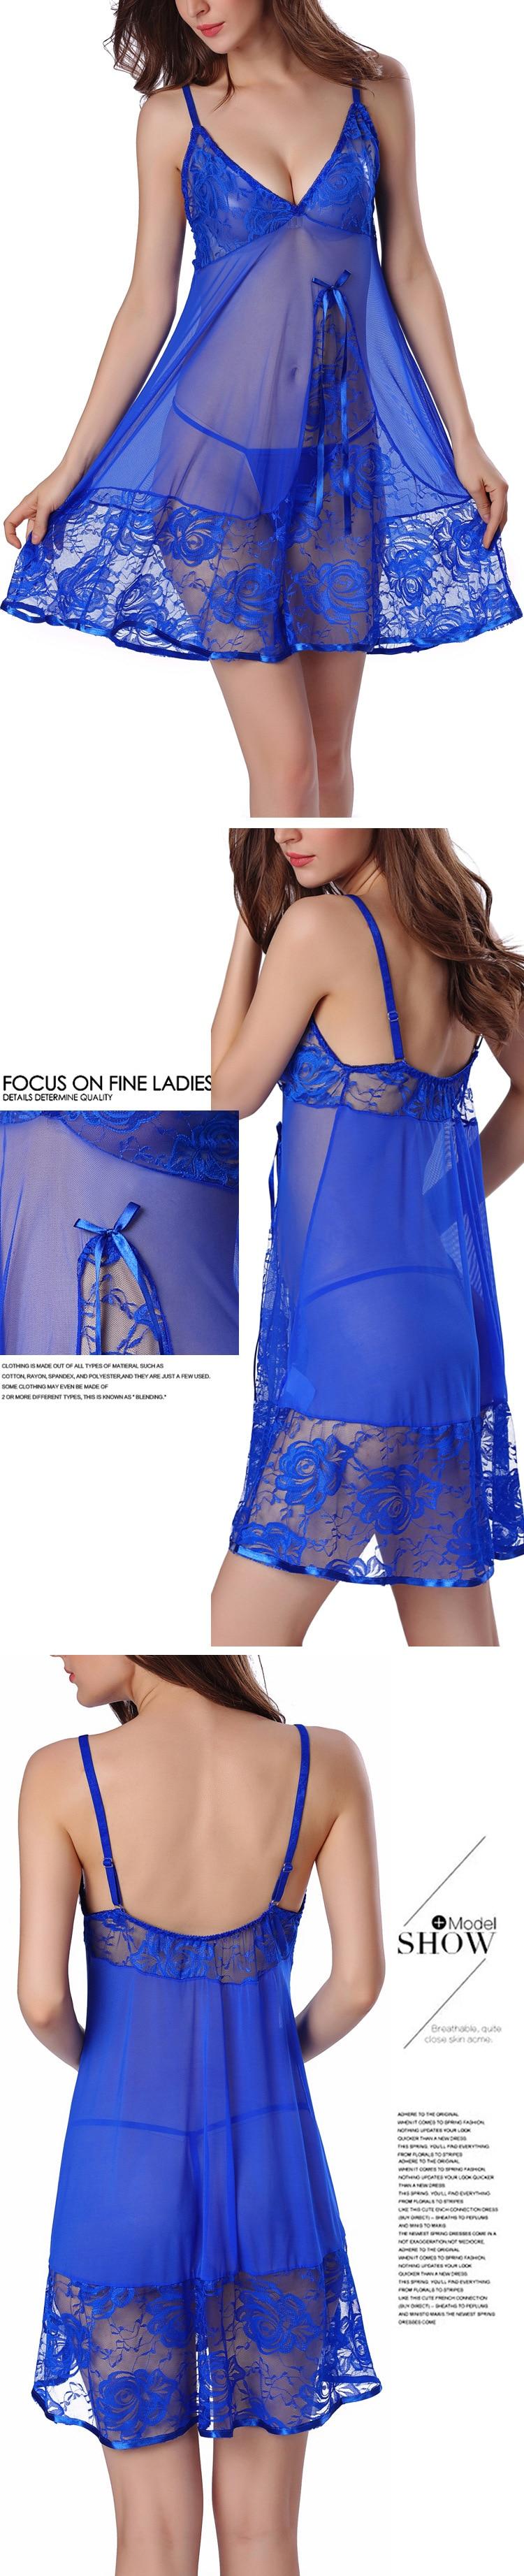 NEW 2017 women sexy lingerie High quality ladies full lace slips S-XXL women slips